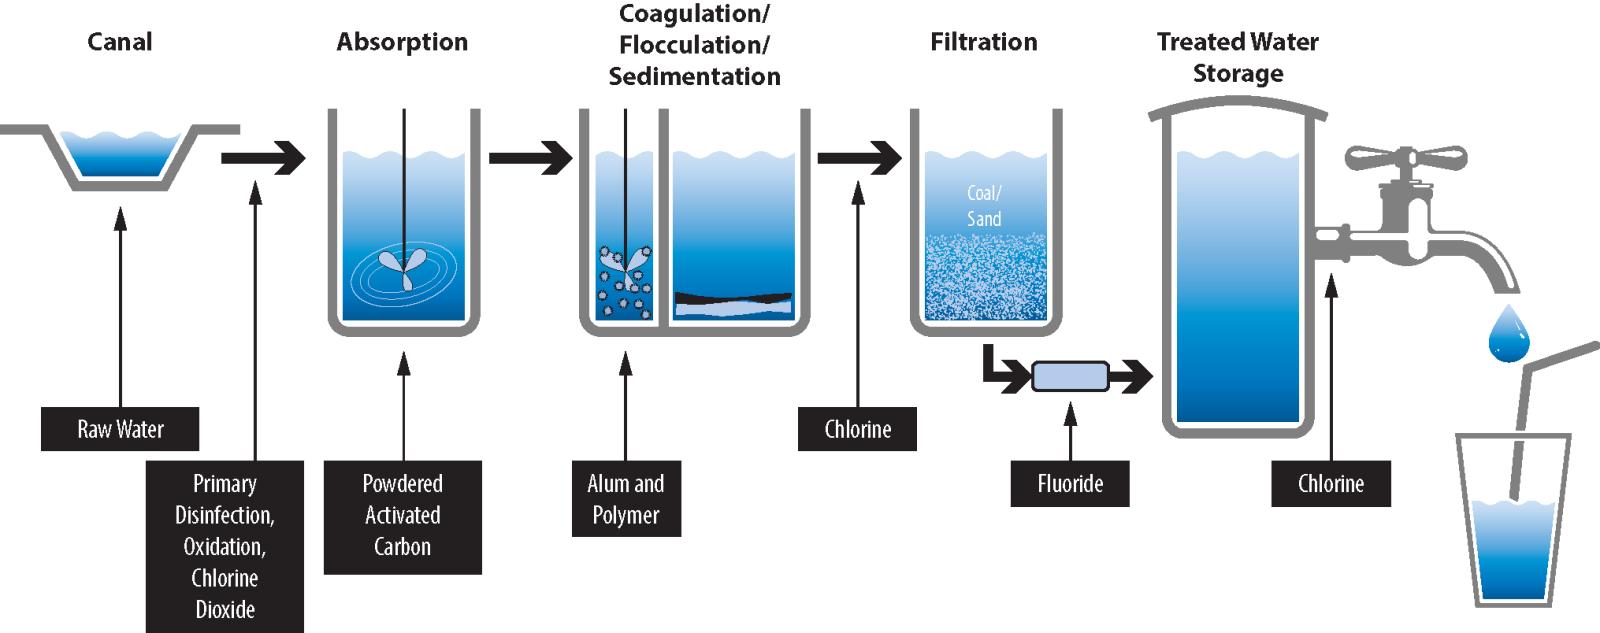 Mesa Arizona Water Quality Report